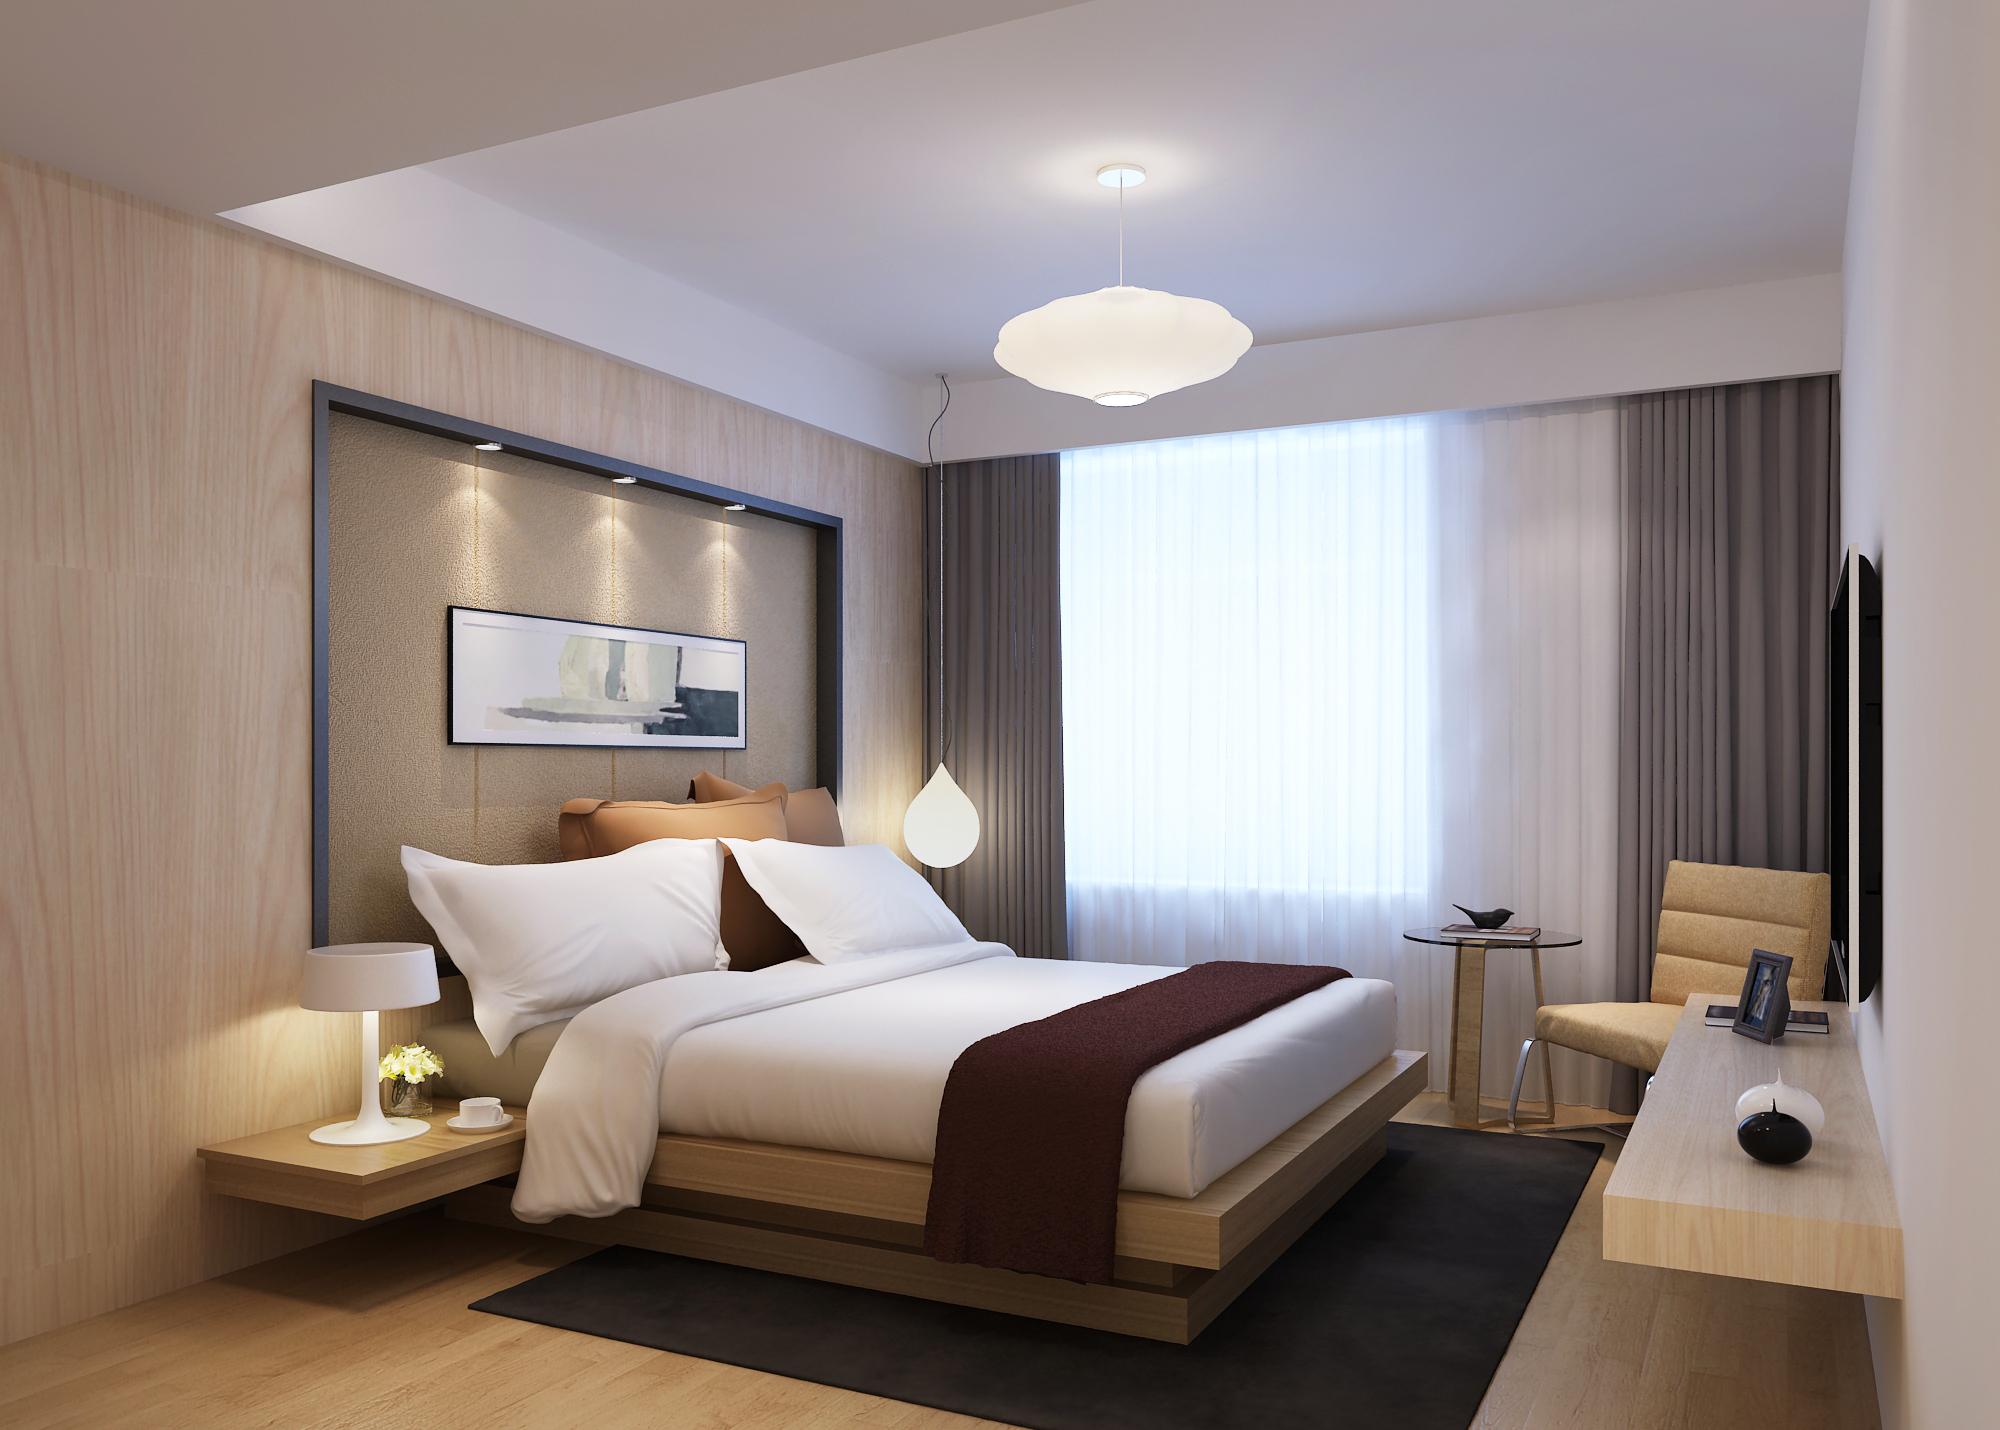 Modern Bedroom 3D Model MAX | CGTrader.com on Model Bedroom Design  id=50442